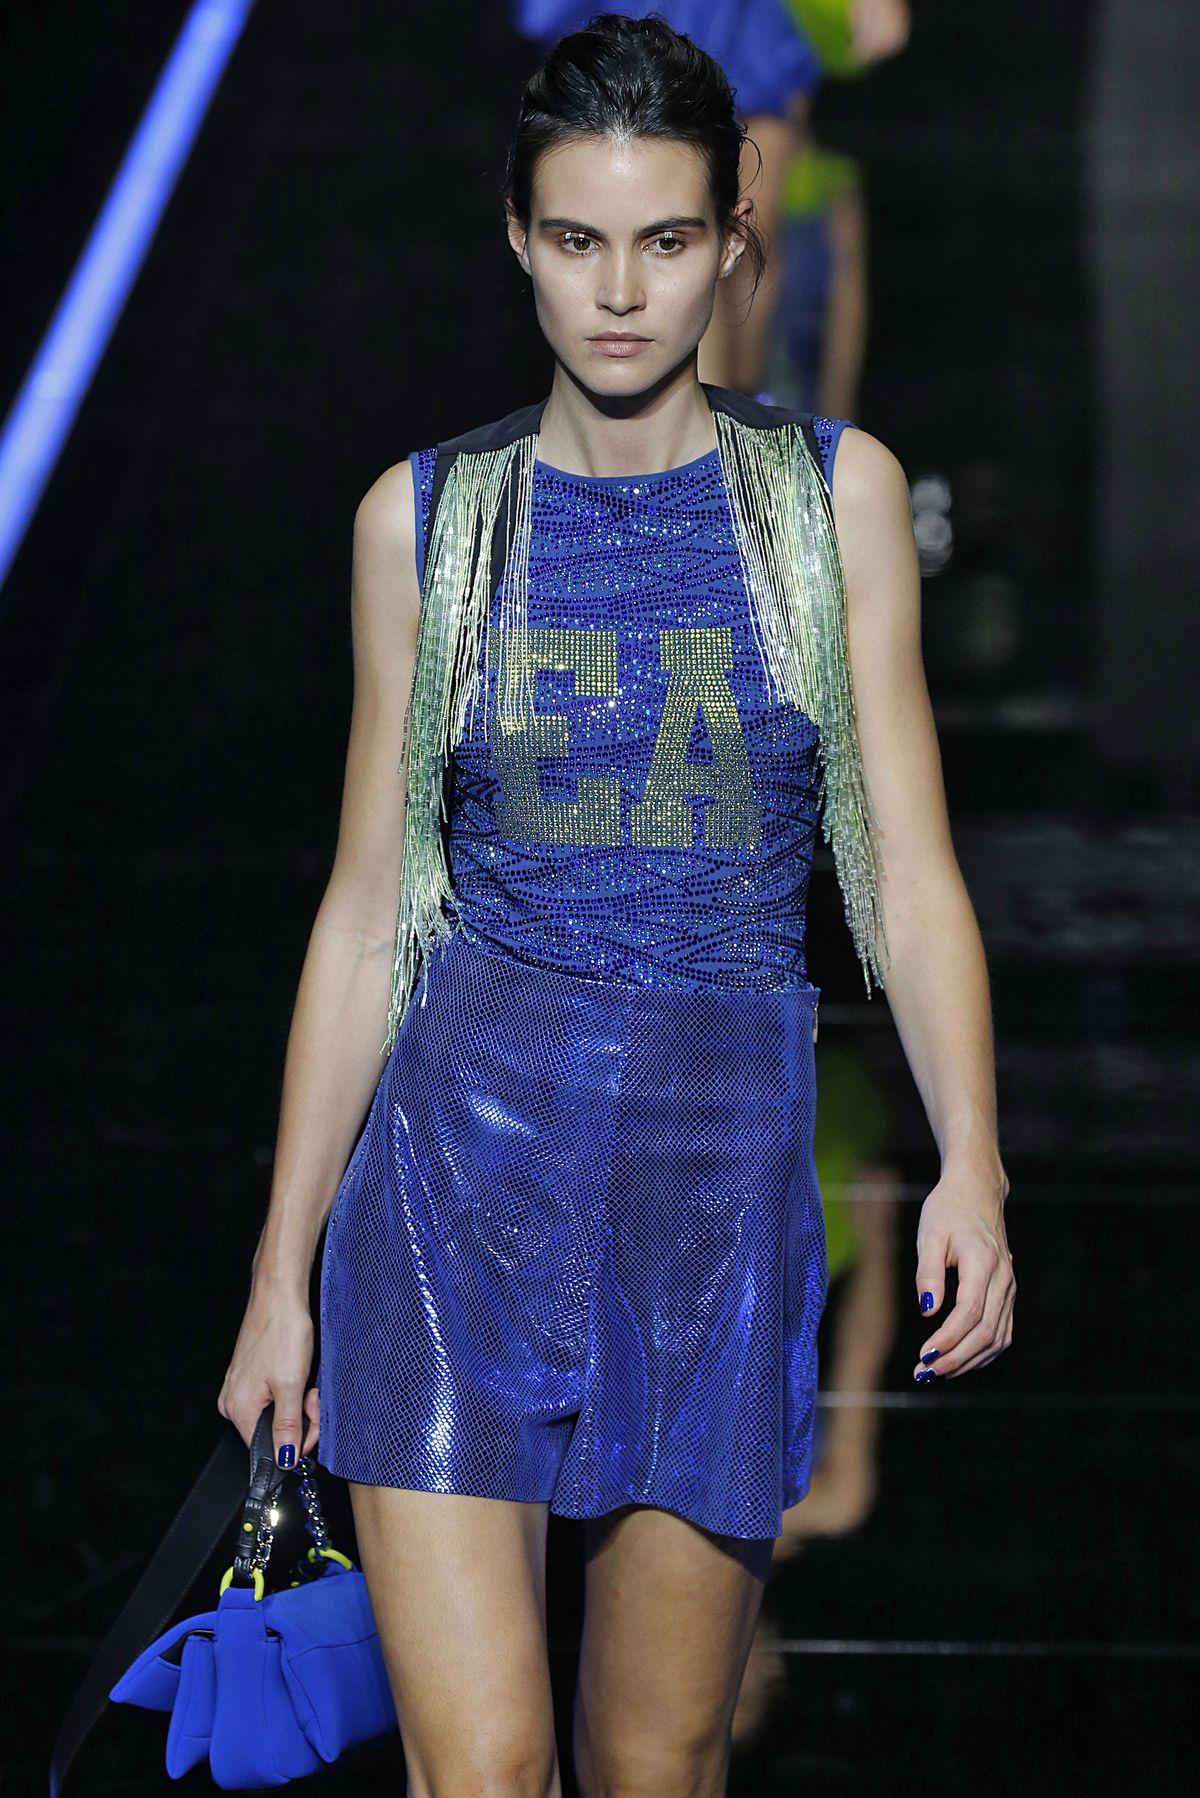 Model im perfekten Festival-Outfit von Emporio Armani.